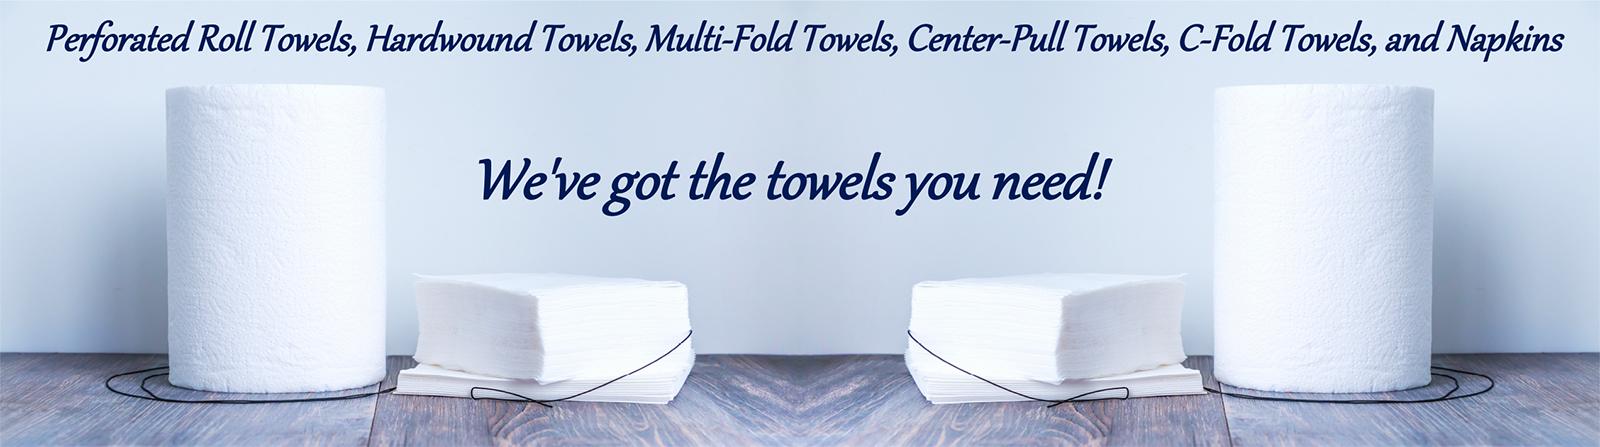 paper-towels-banner.jpg